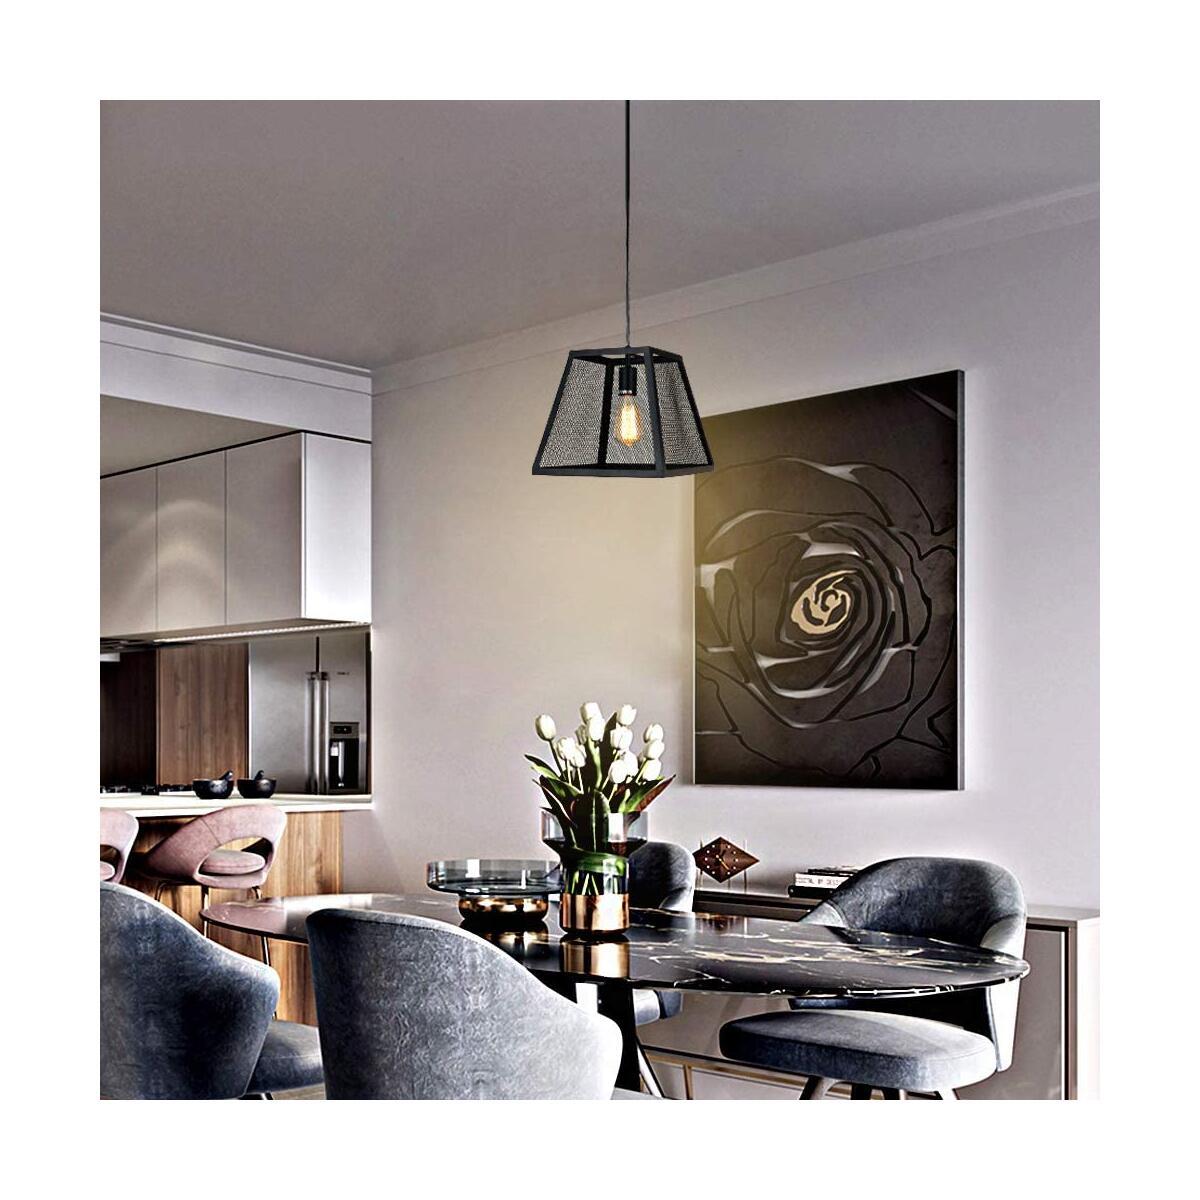 1-Light Industrial Pendant Lighting for Kitchen Island, 11.42